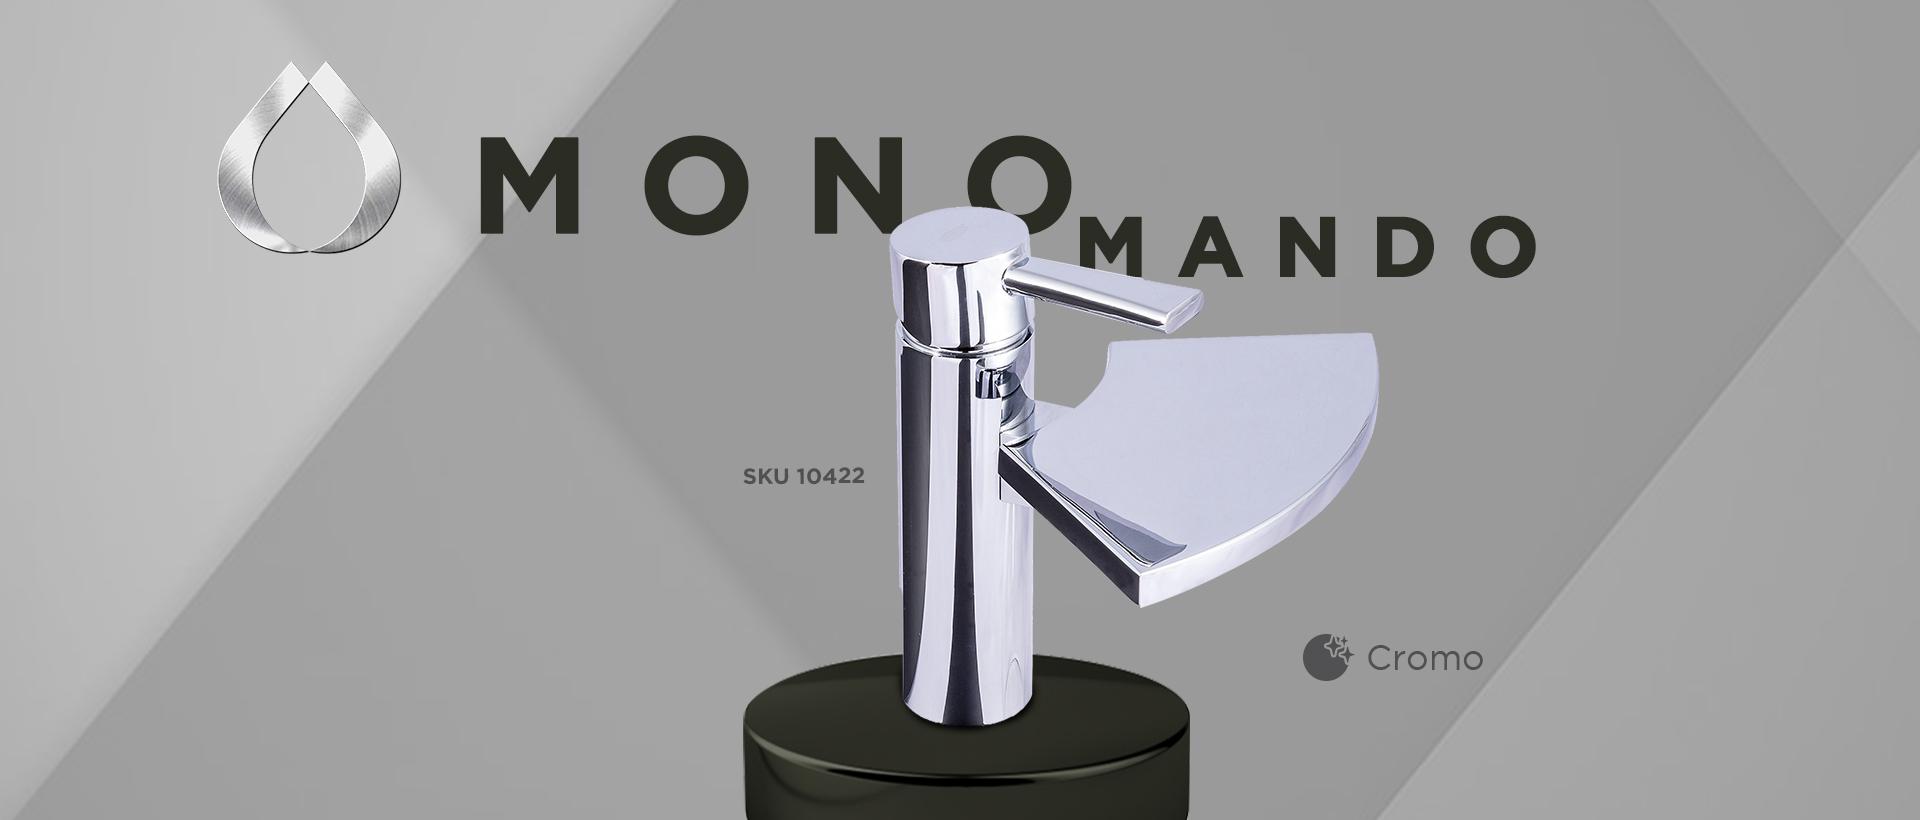 Monomando 10422